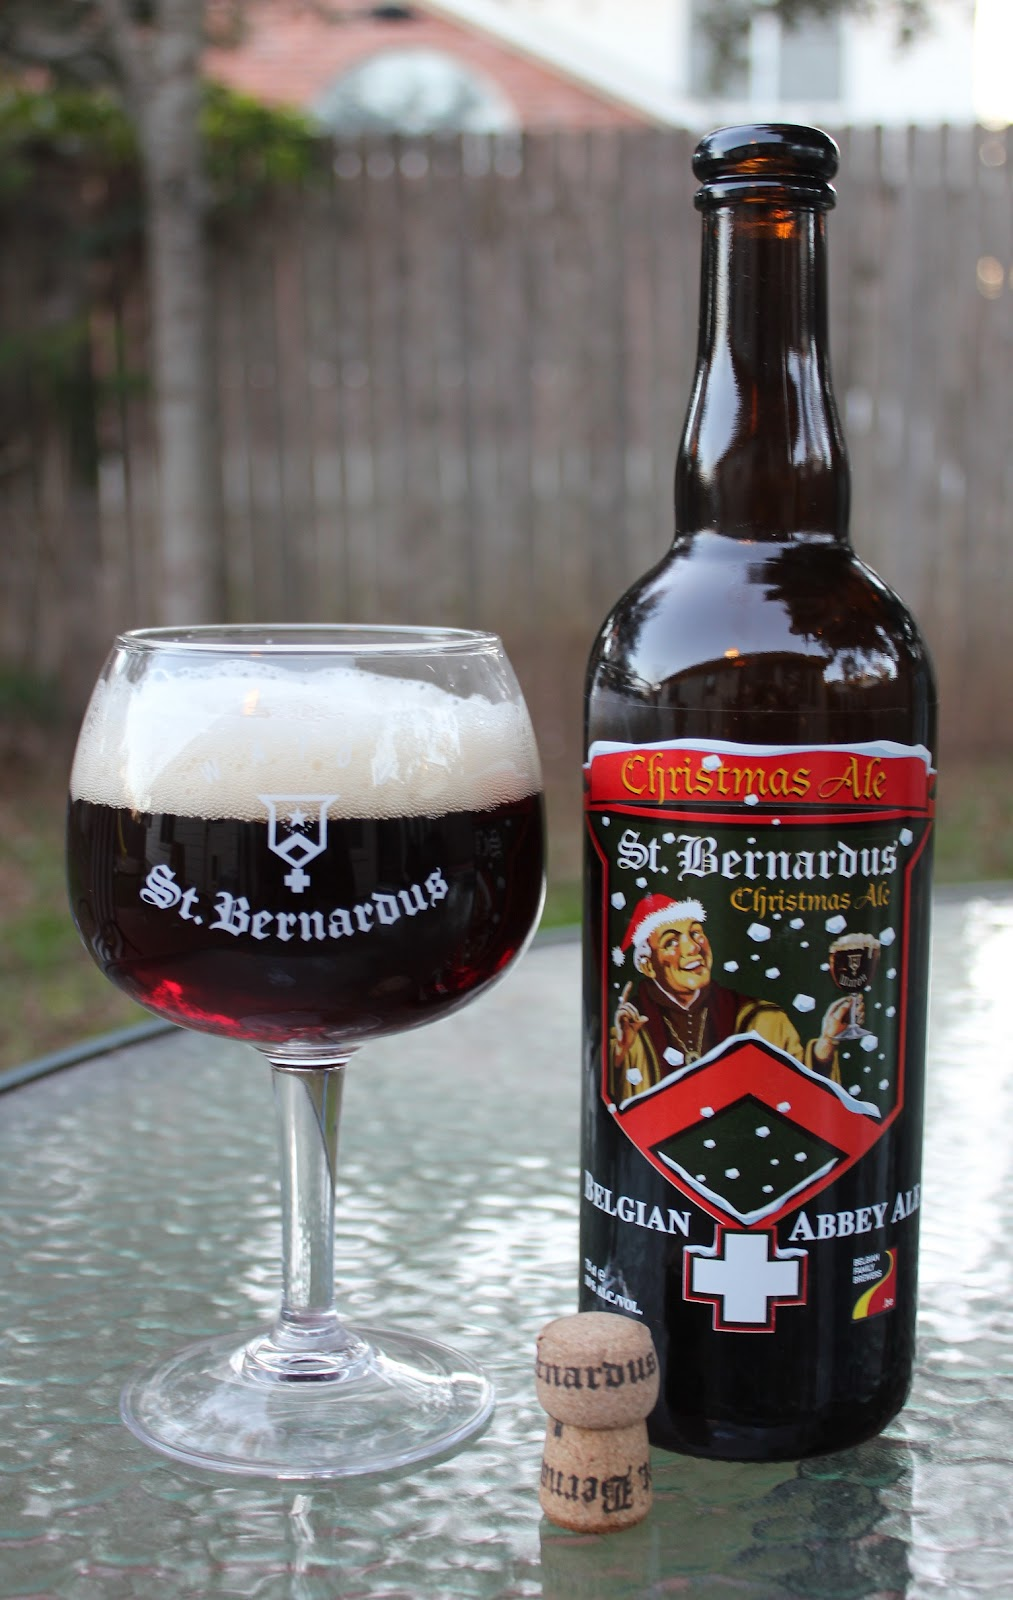 THE BRÜ: The Brü Revü – St. Bernardus Christmas Ale